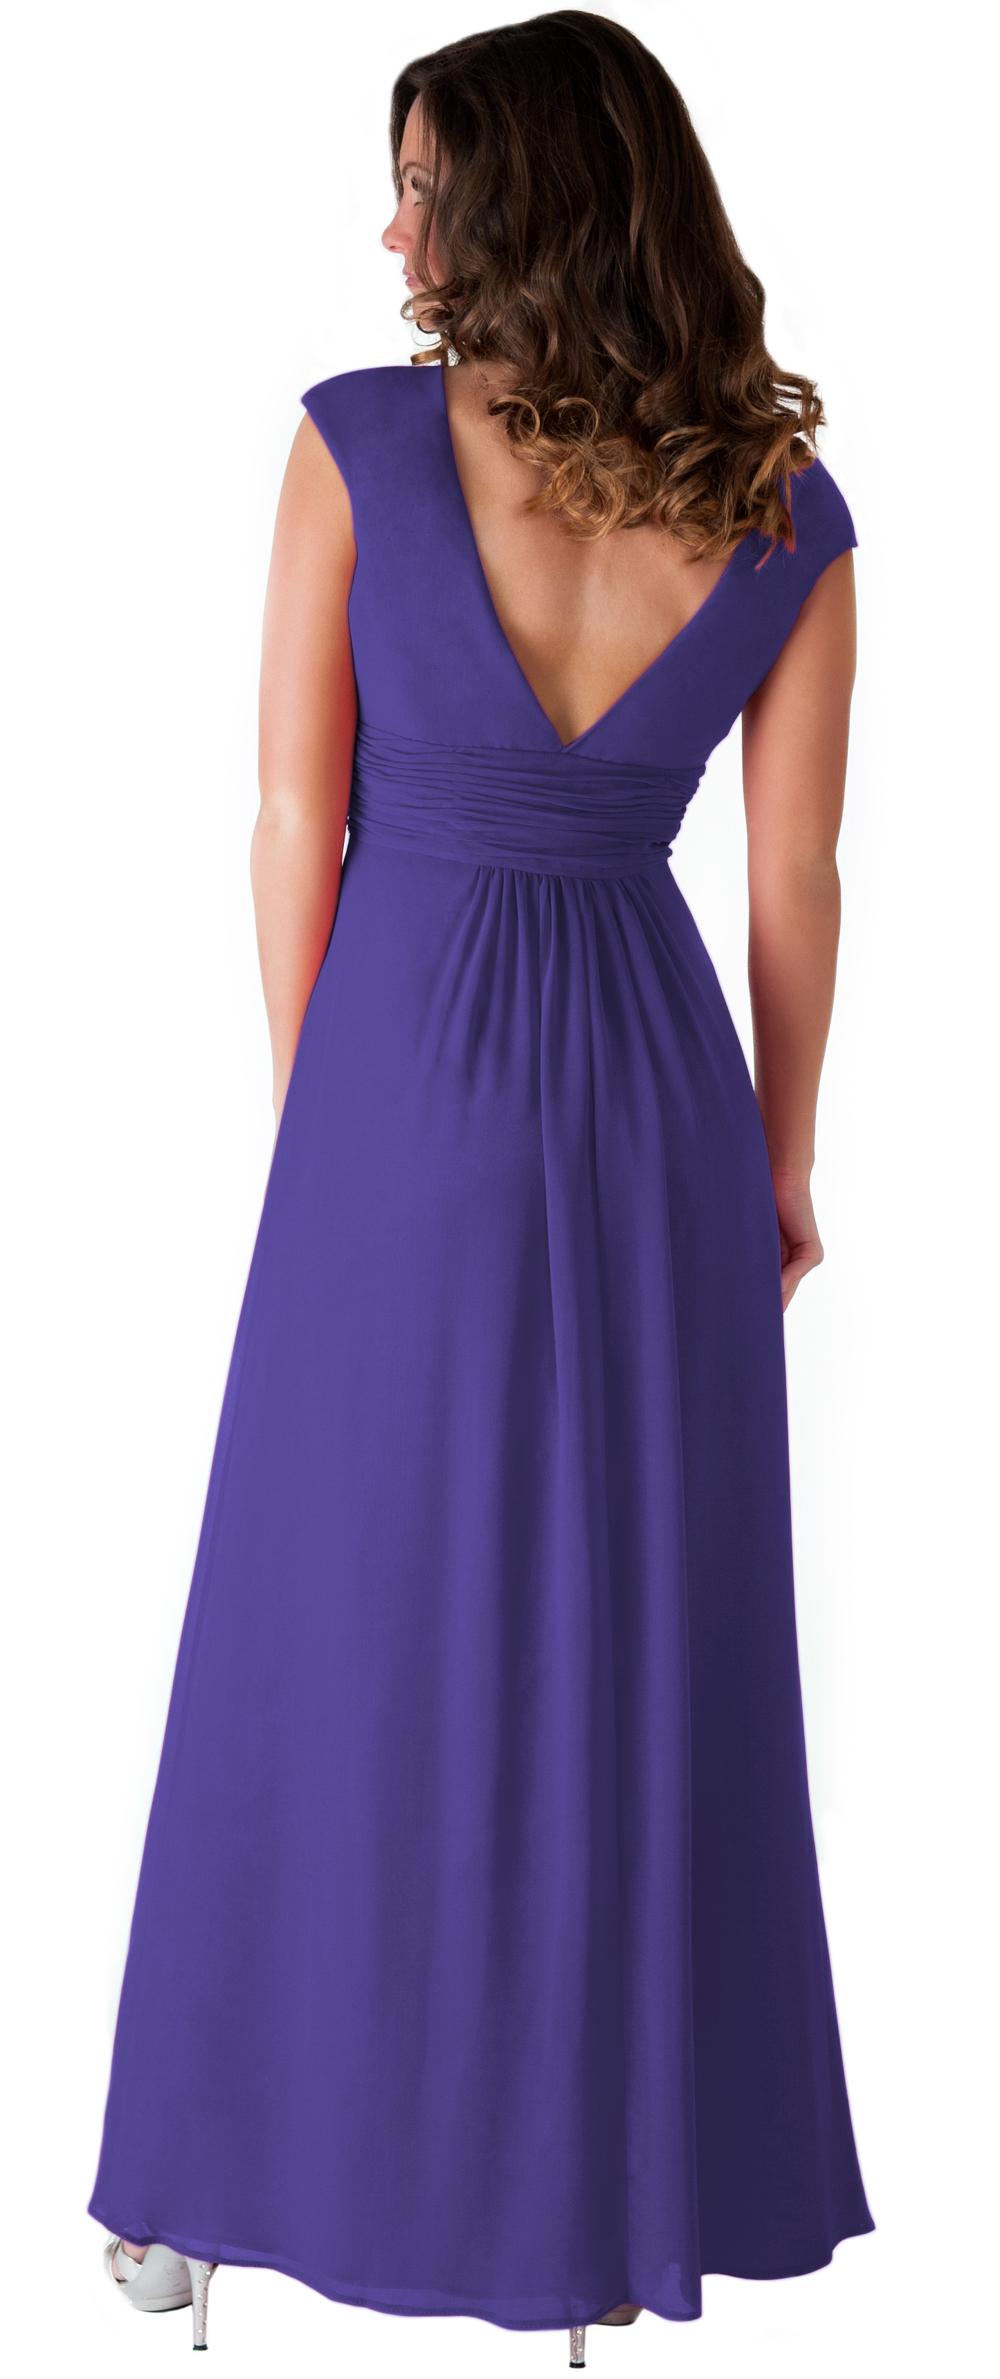 Formal Dress Elegant Women Long Evening Gown Bridesmaid Wedding ...